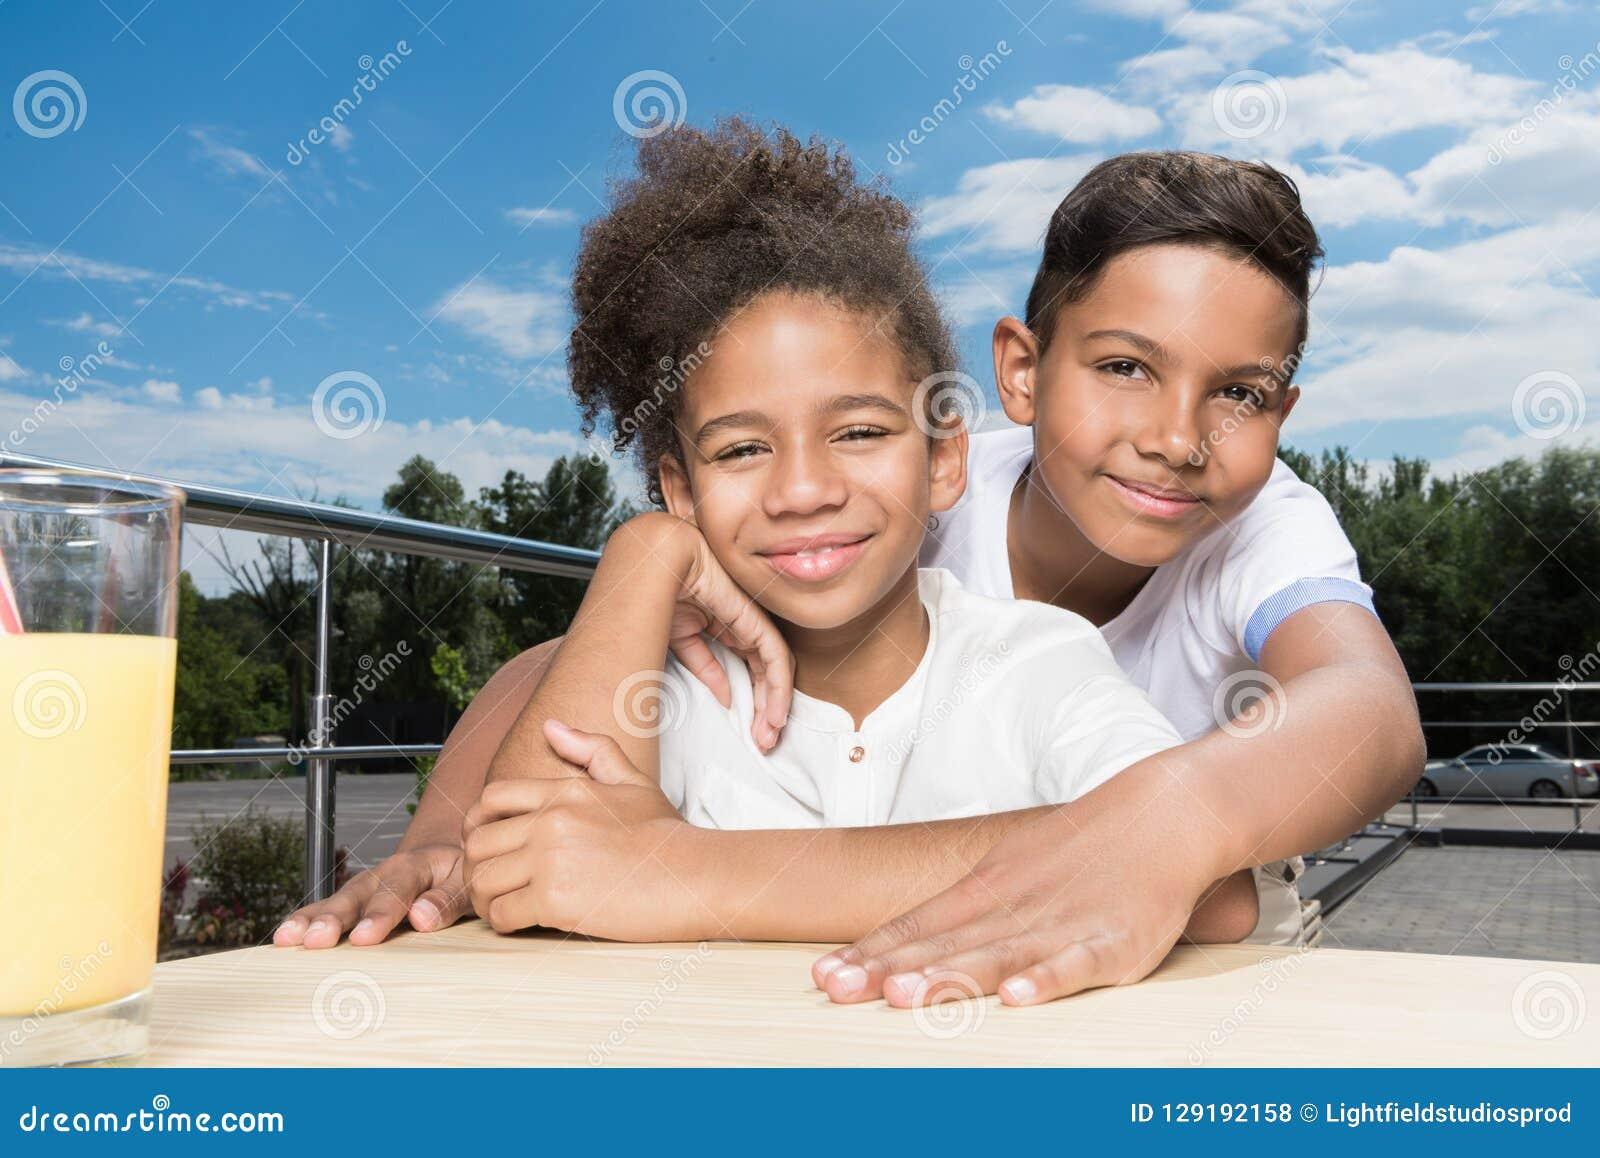 adorable african-american kids embracing